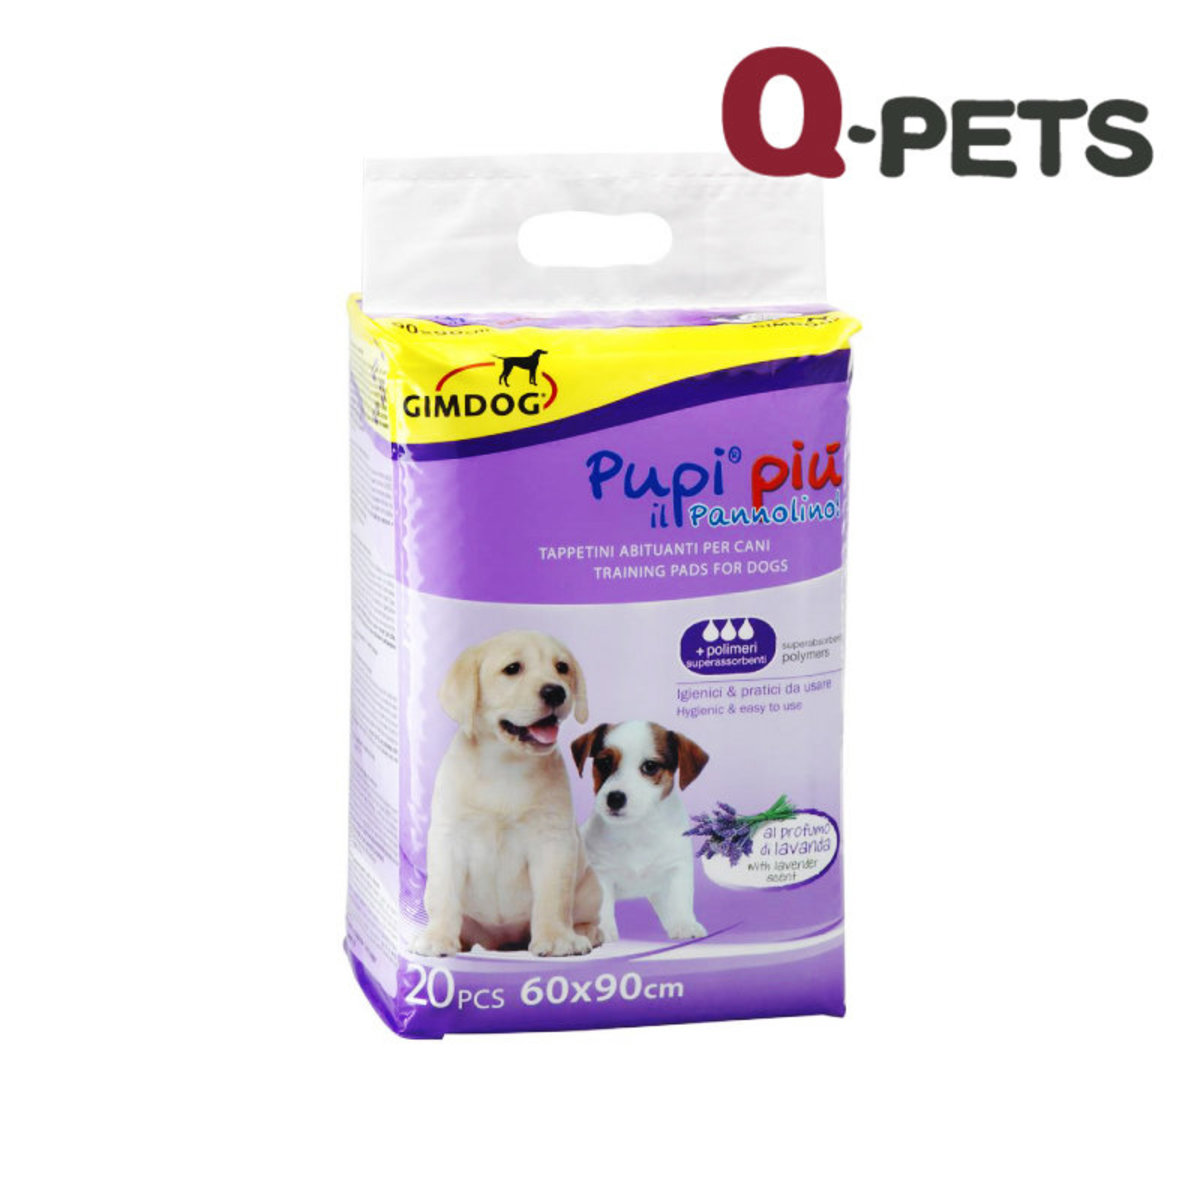 DOG SHEET PUPI PIU 60X90 WITH LAVENDER PERFUME - 20PCS